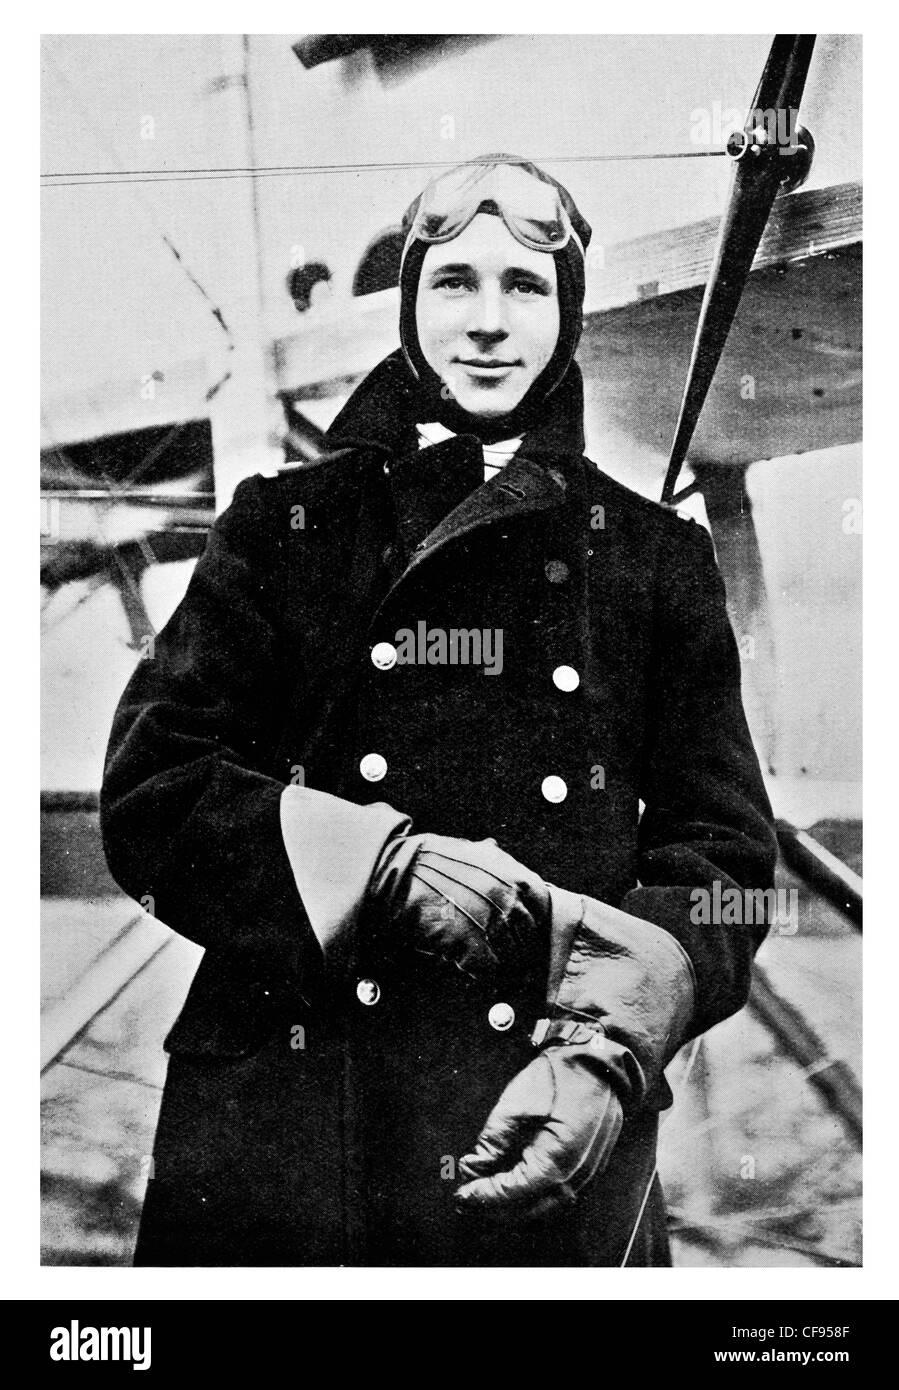 Lieut Reginald Alexander John Warneford, VC Royal Naval Air Service (RNAS) officer who received the Victoria Cross, - Stock Image